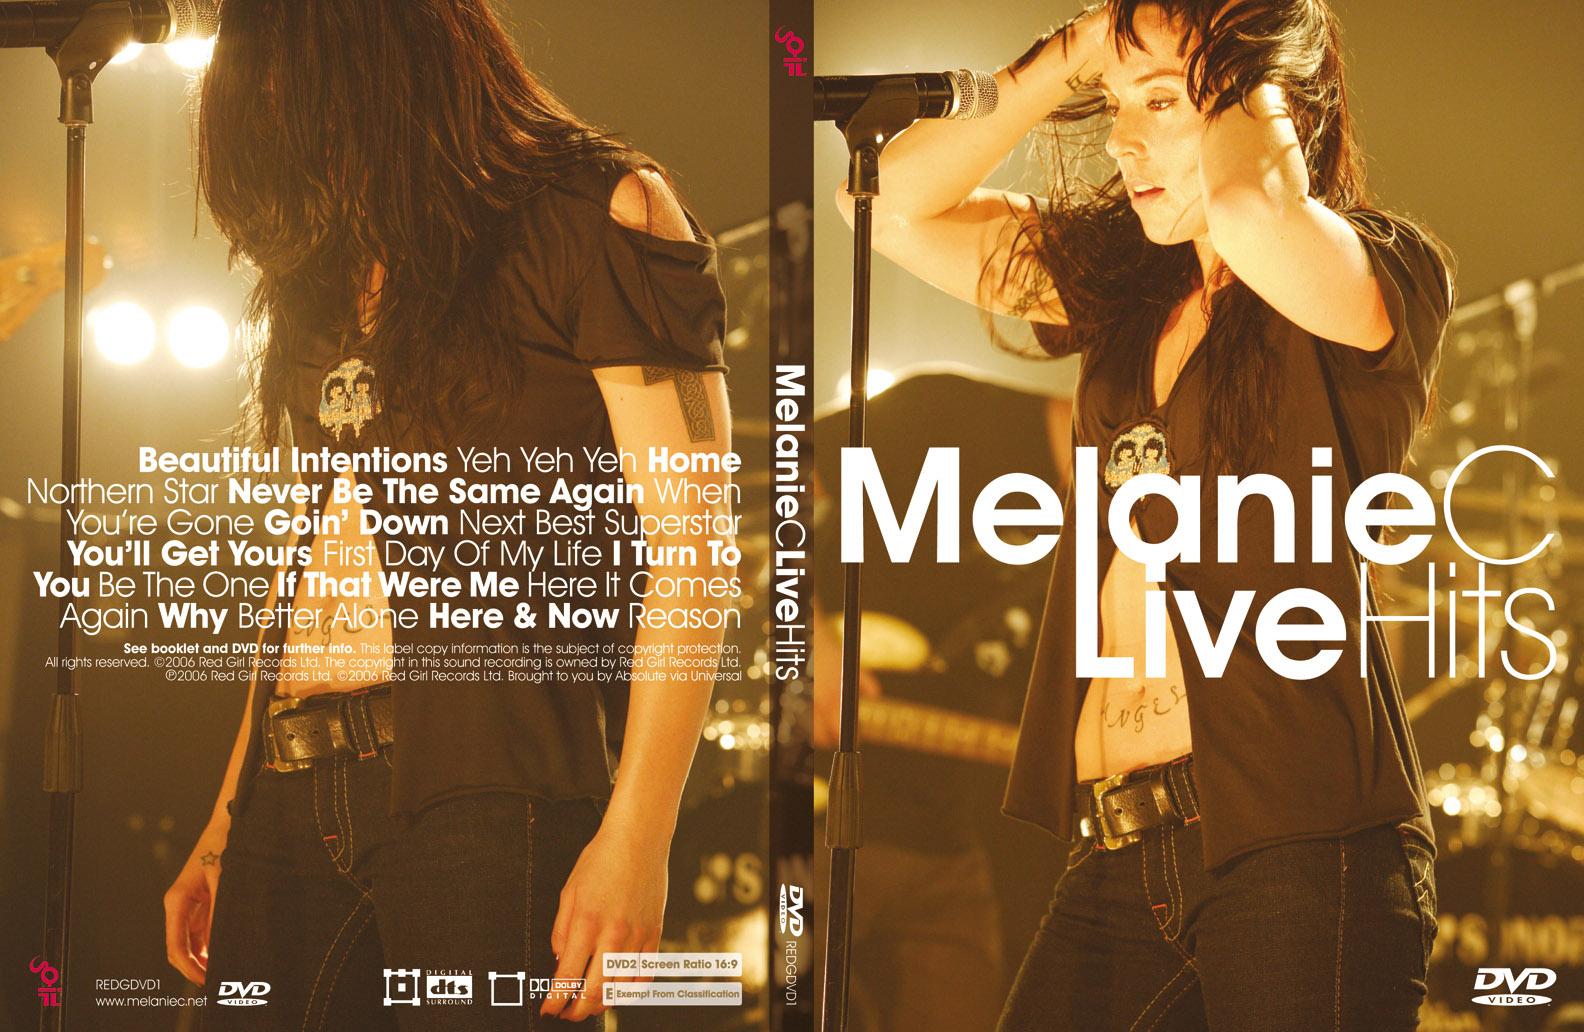 MelanieC_LiveHits